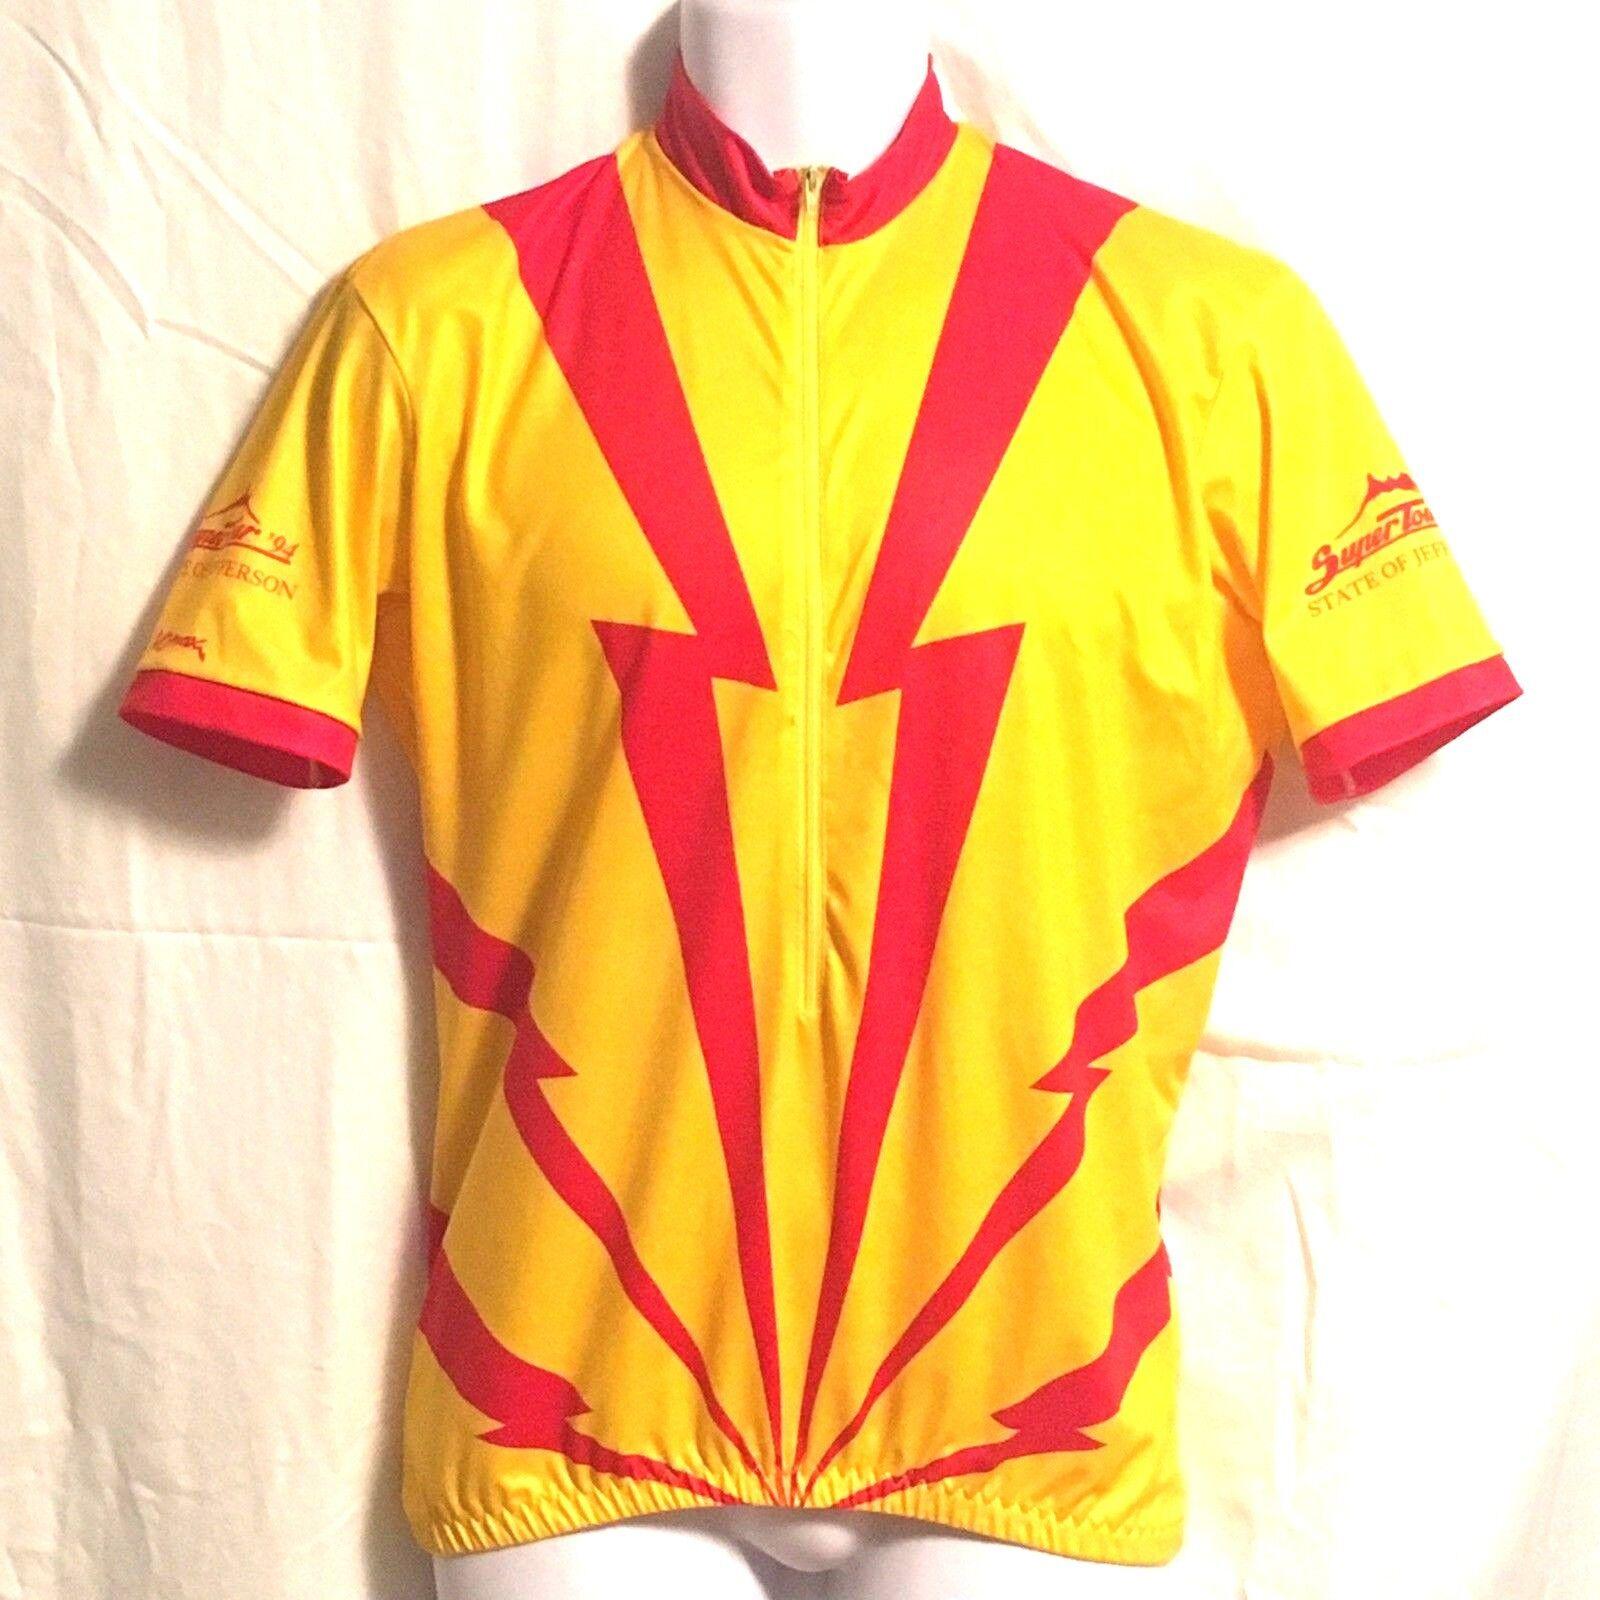 súper circuito de camisetas de bicicleta vomax retro 1994 Estado de relámpago Jefferson LG